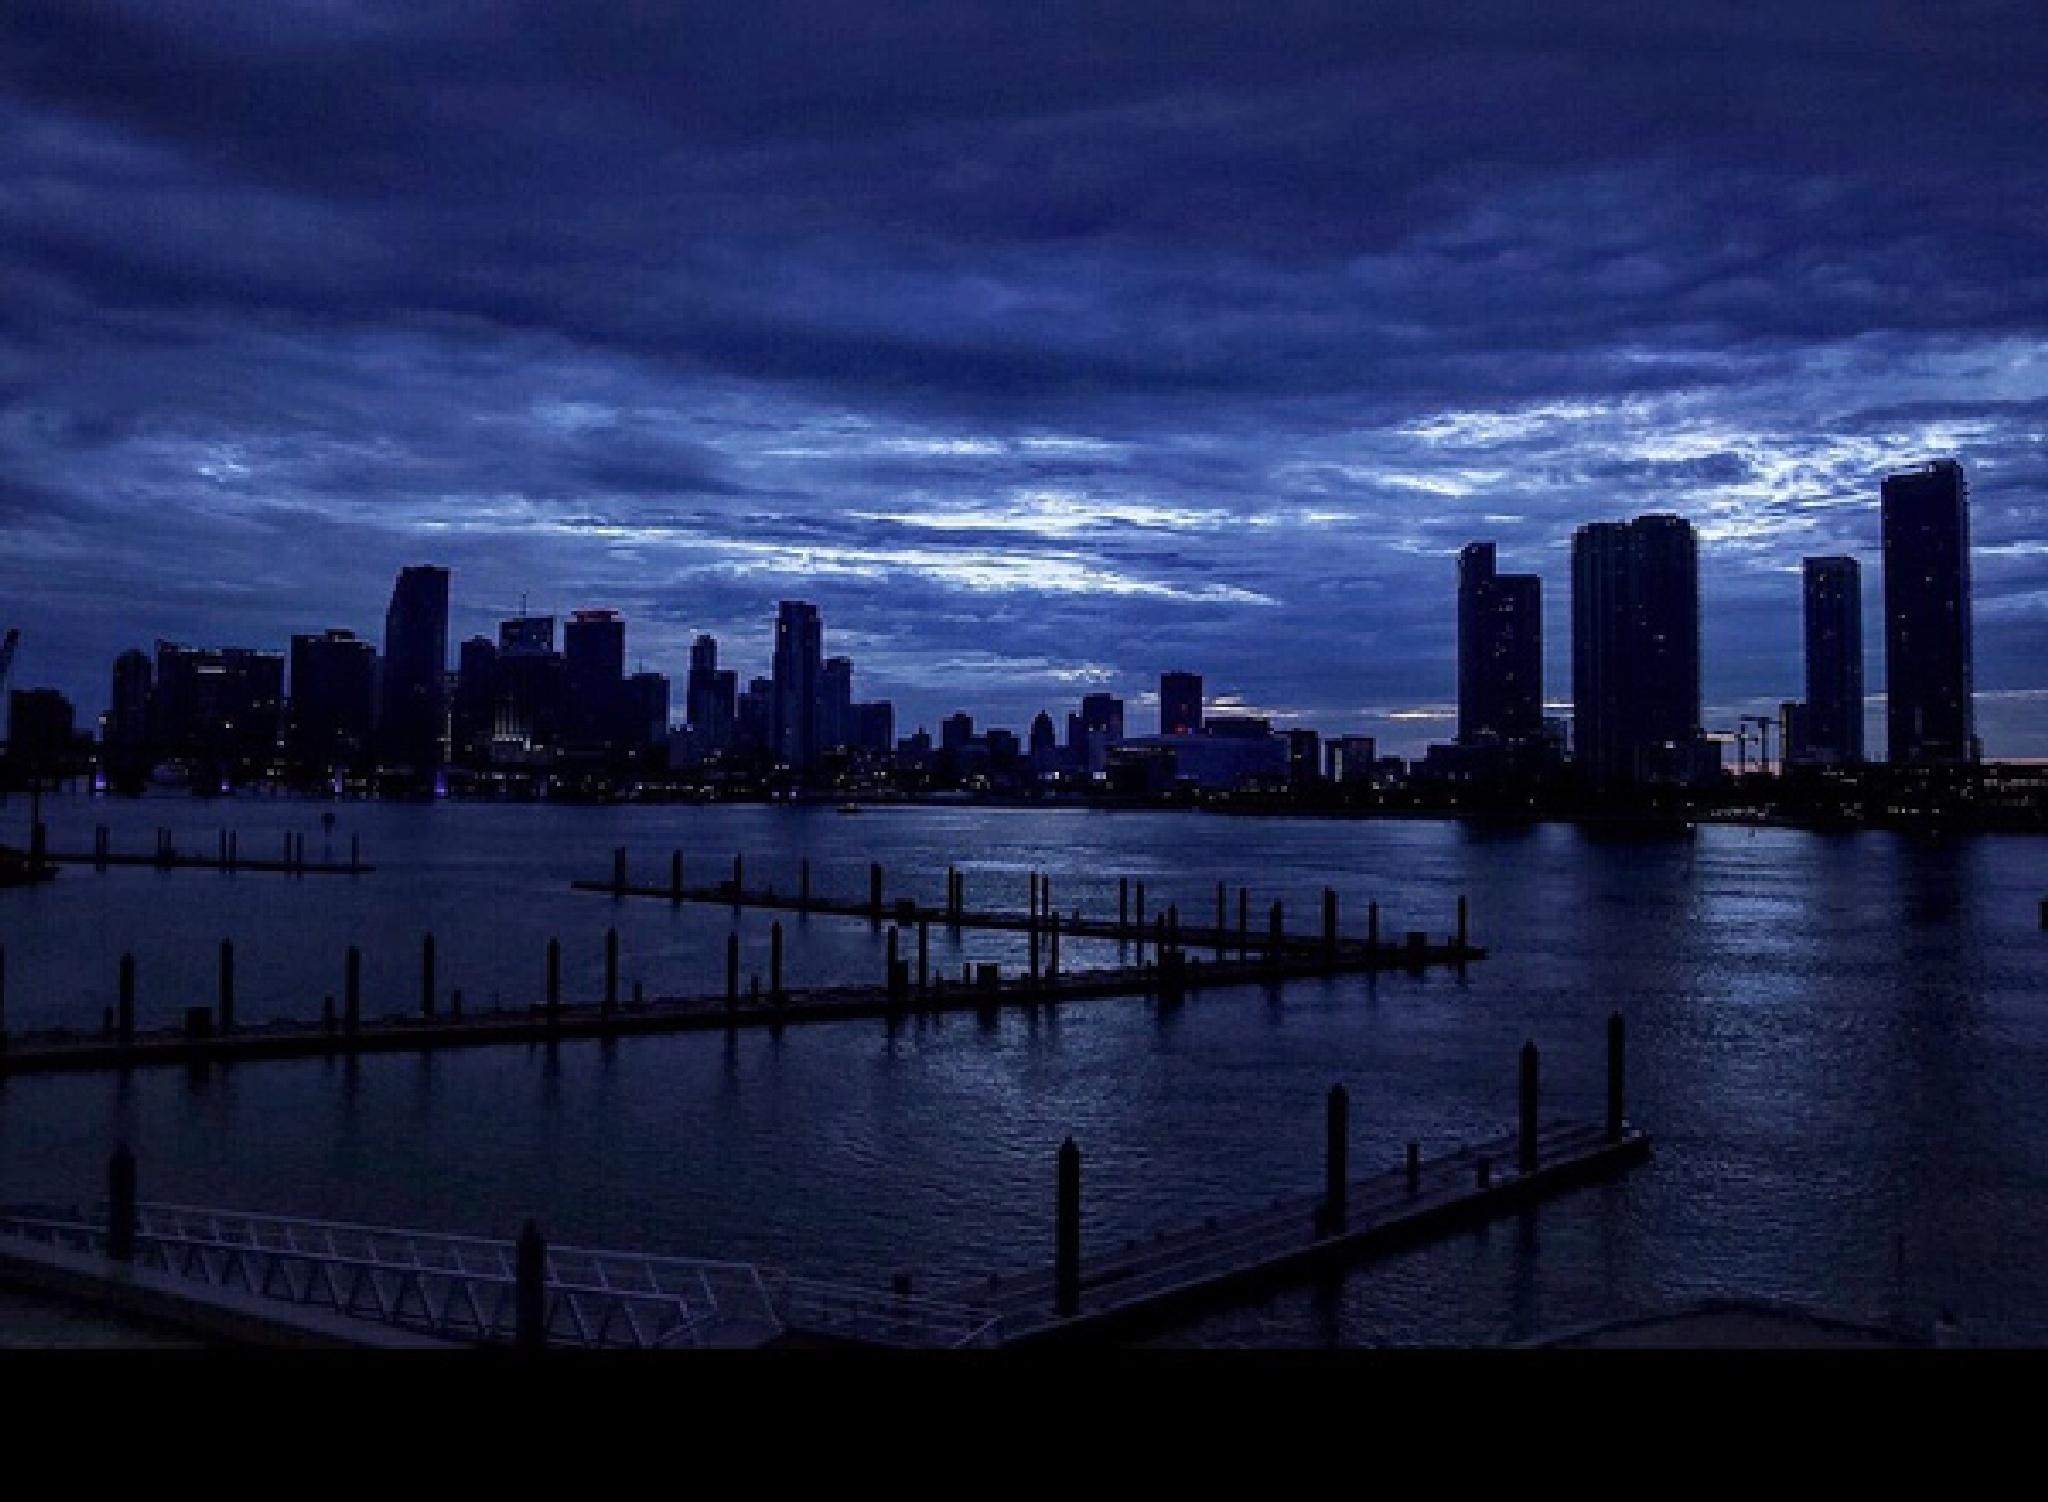 City at Night by Serge Kay